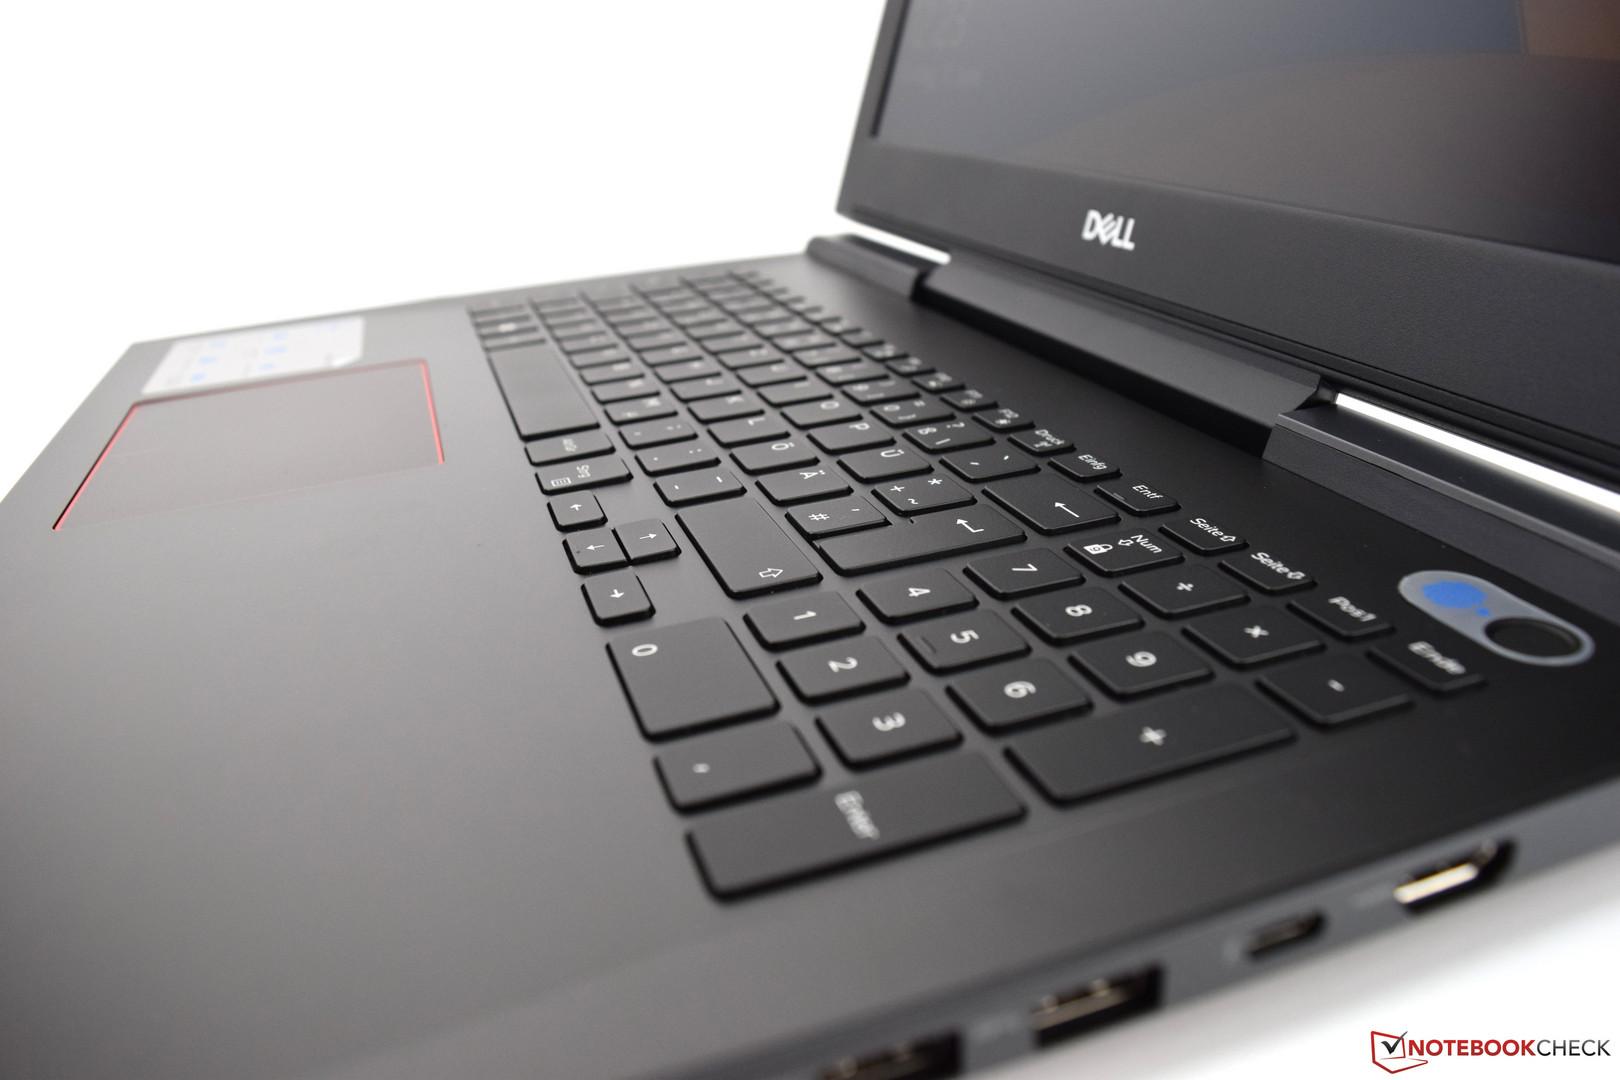 Kısa inceleme: Dell G5 15 5587 (i5-8300H, GTX 1060 Max-Q, SSD, IPS